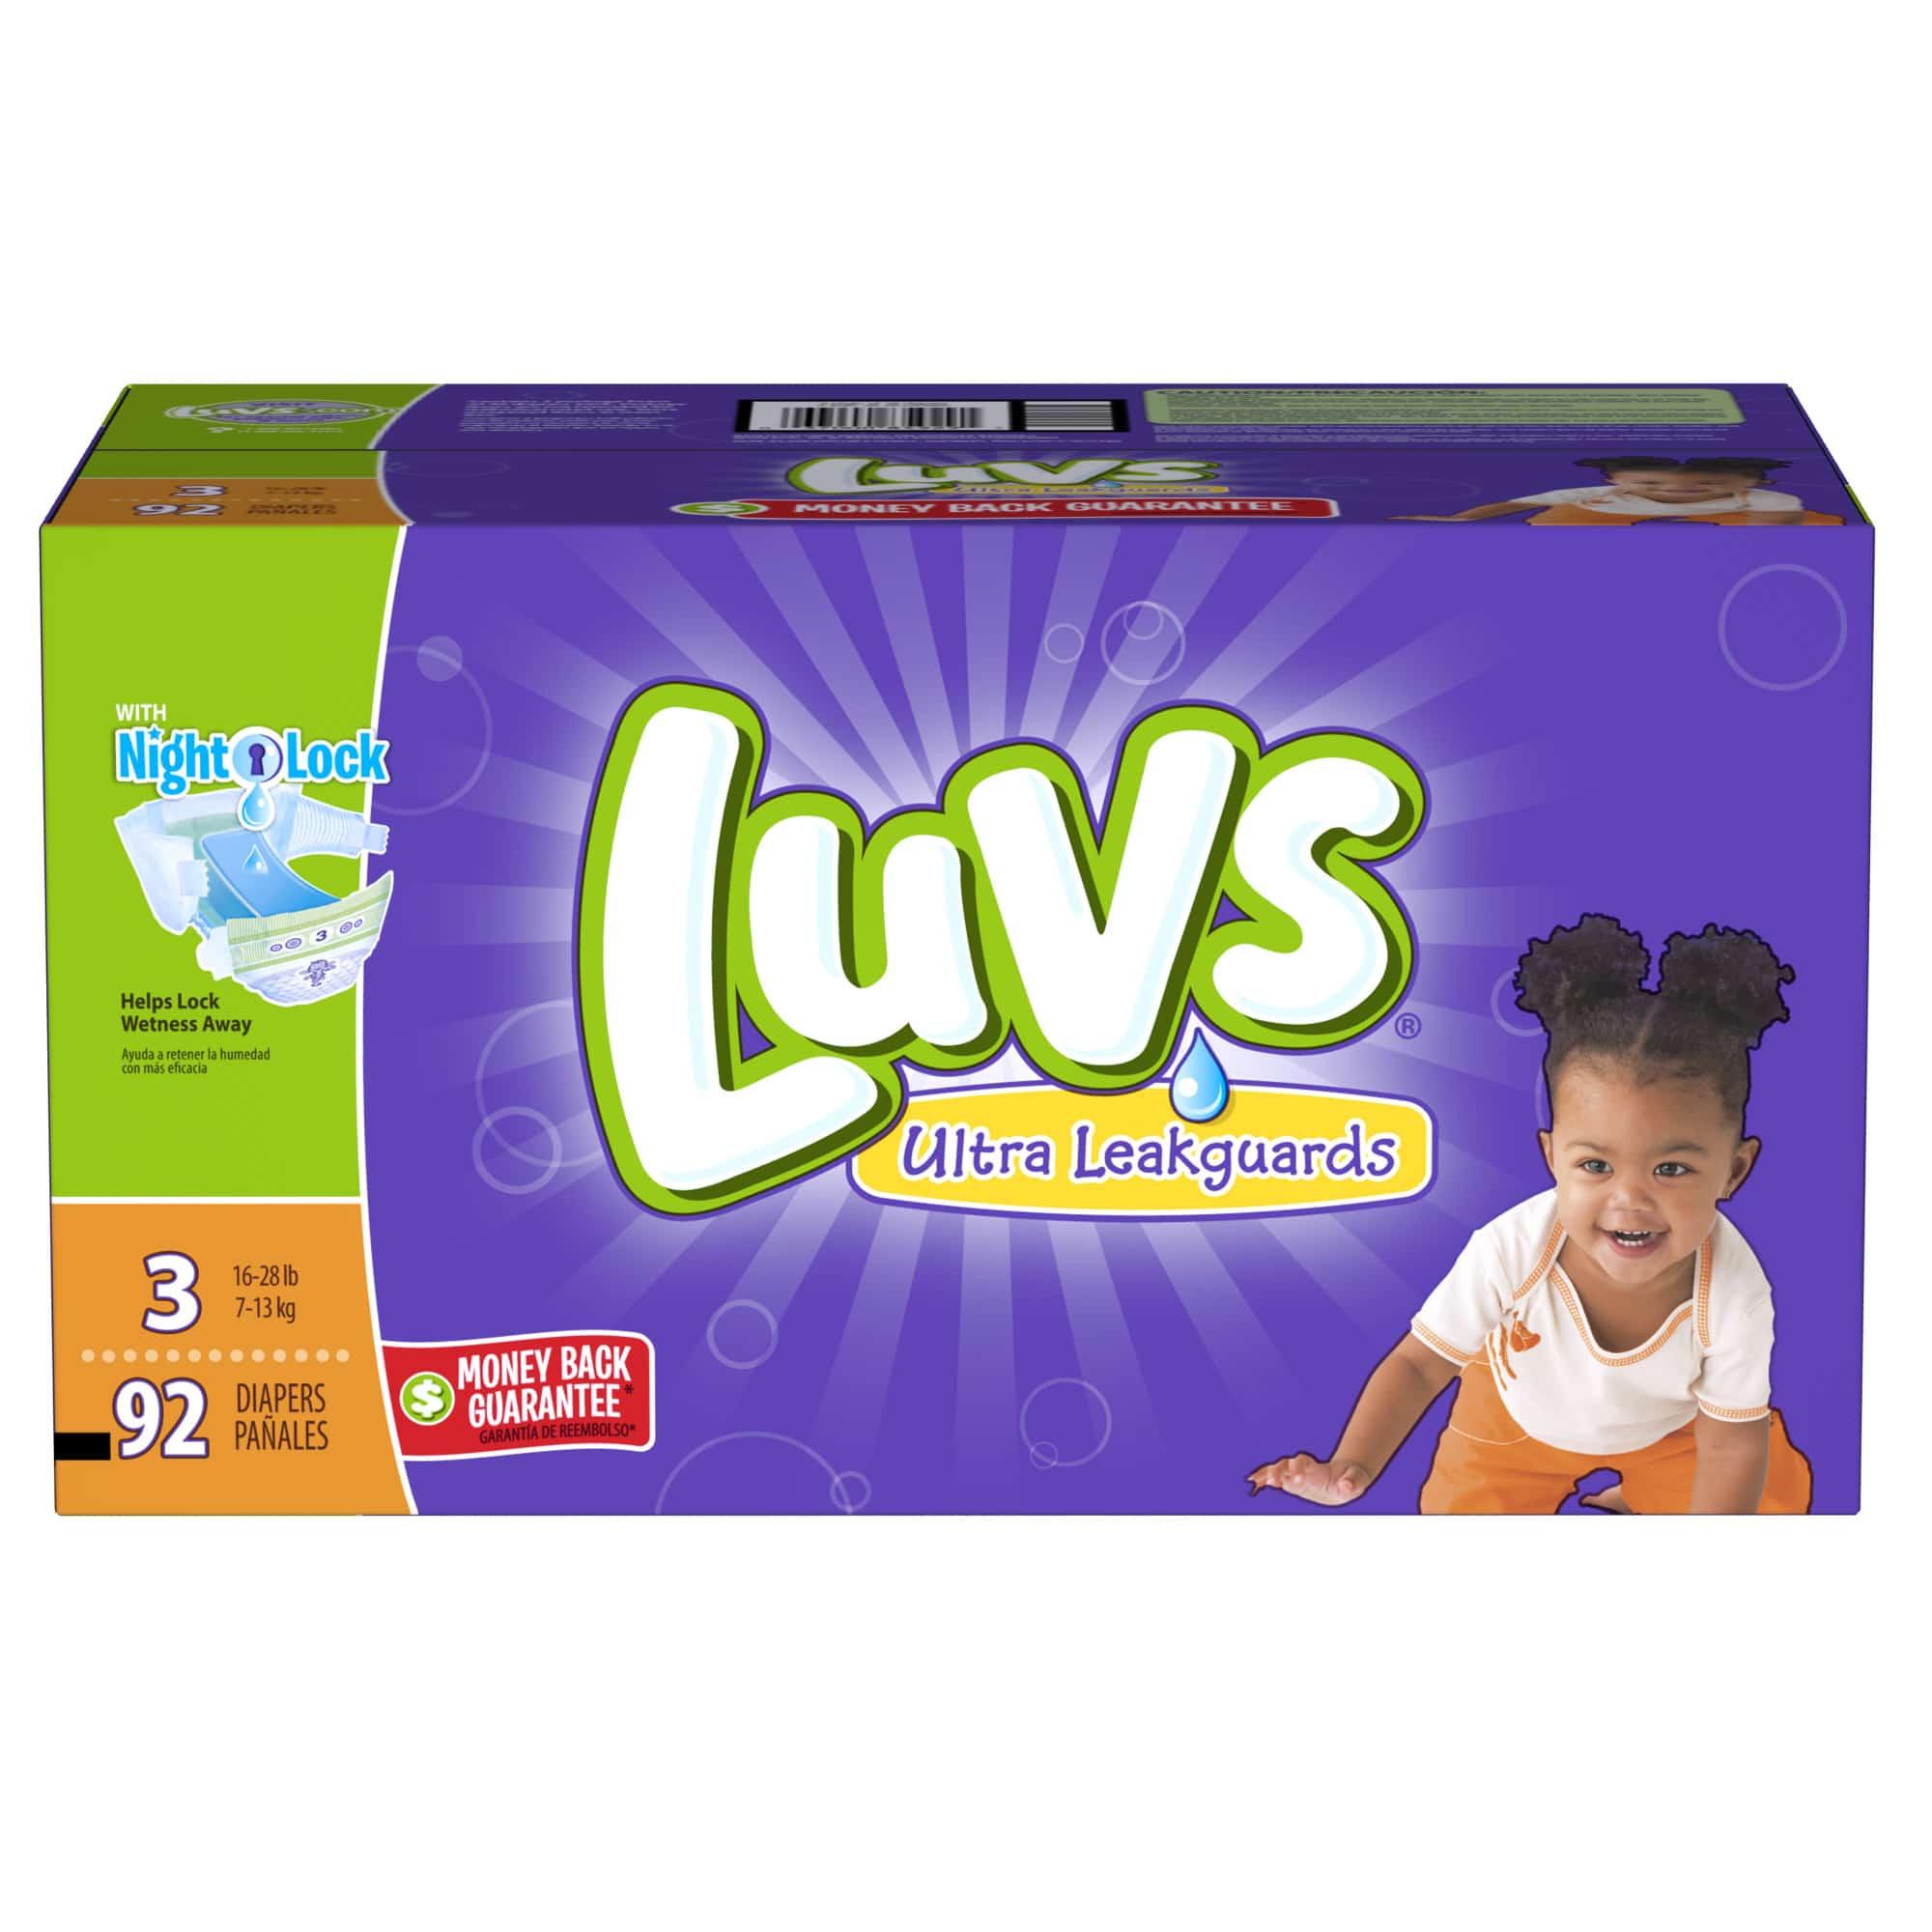 graphic regarding Luvs Printable Coupons called $2.00 off Luvs Printable Coupon + $5 Ibotta Rebate